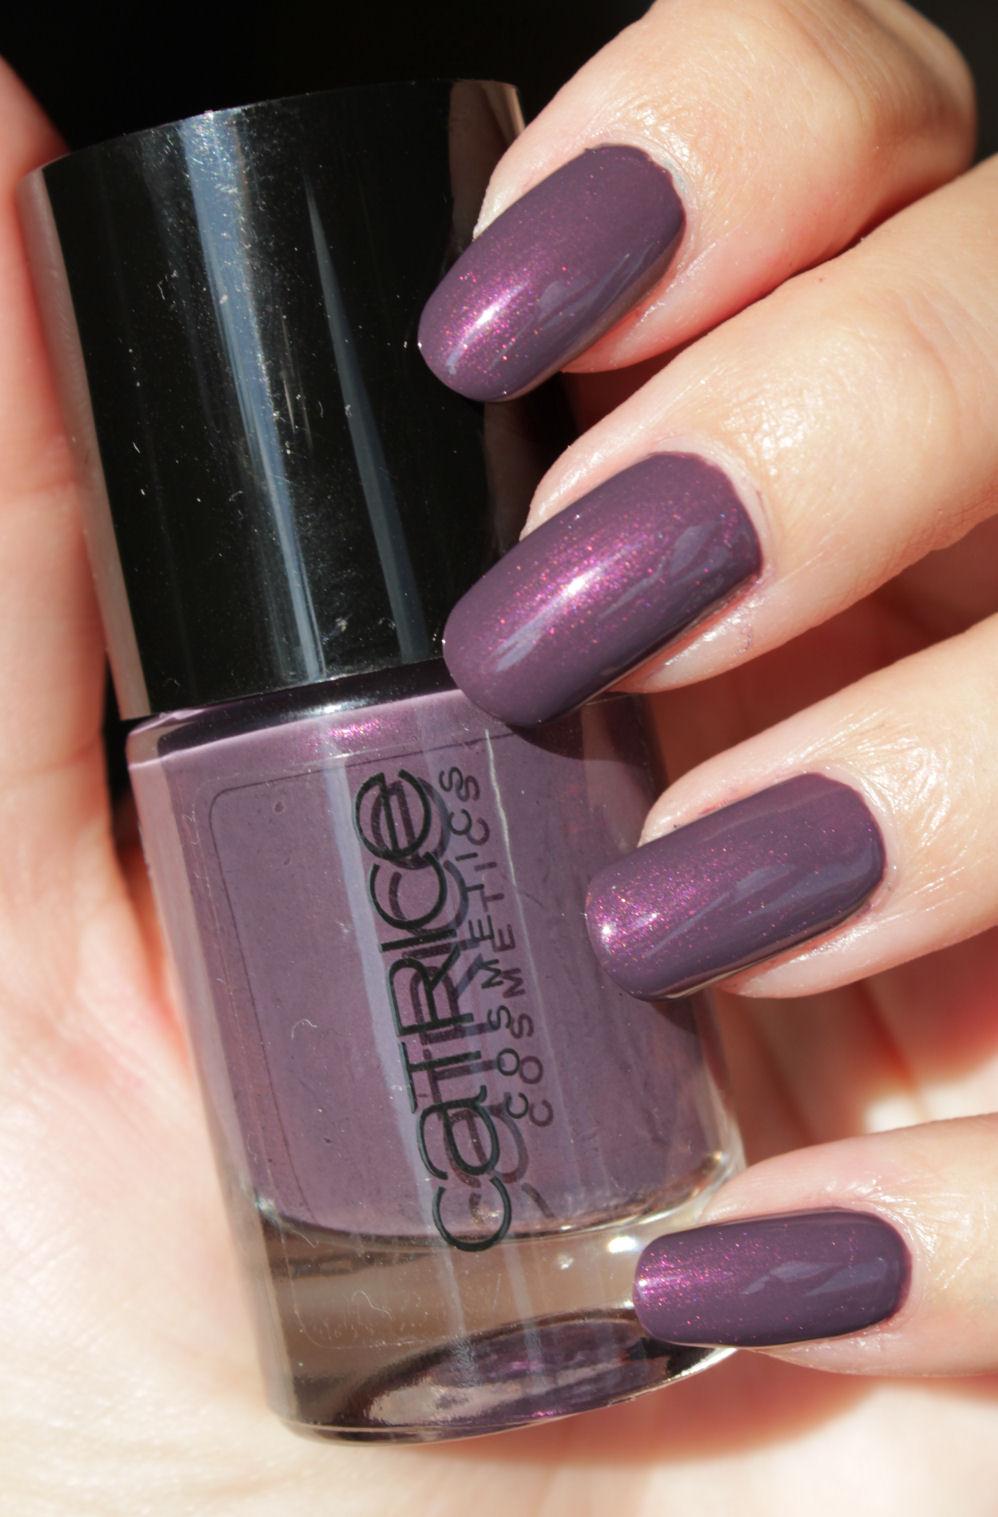 http://lacquediction.blogspot.de/2014/12/catrice-ultimate-nail-lacquer-72-auber.html